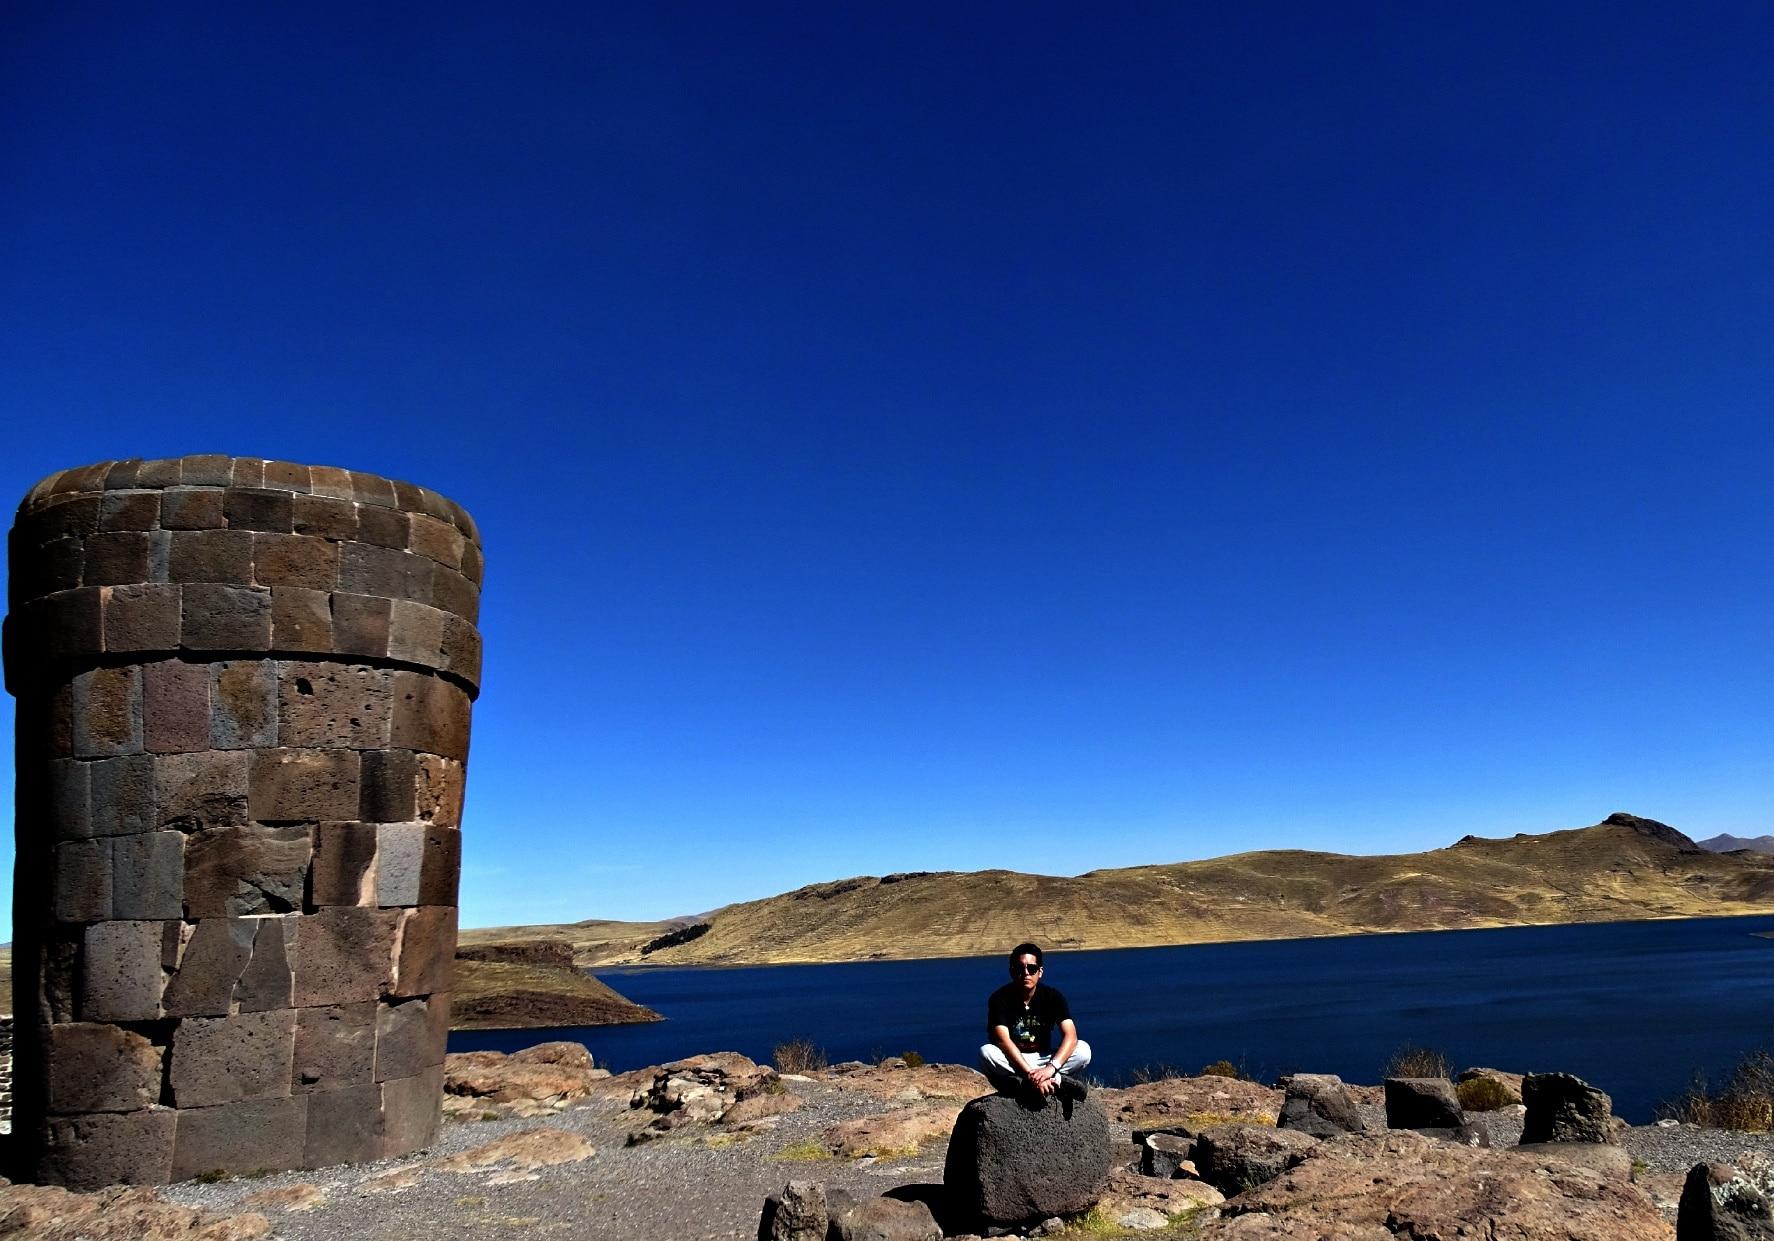 Sillustani, Atuncolla, Puno, Puno (Region), Peru